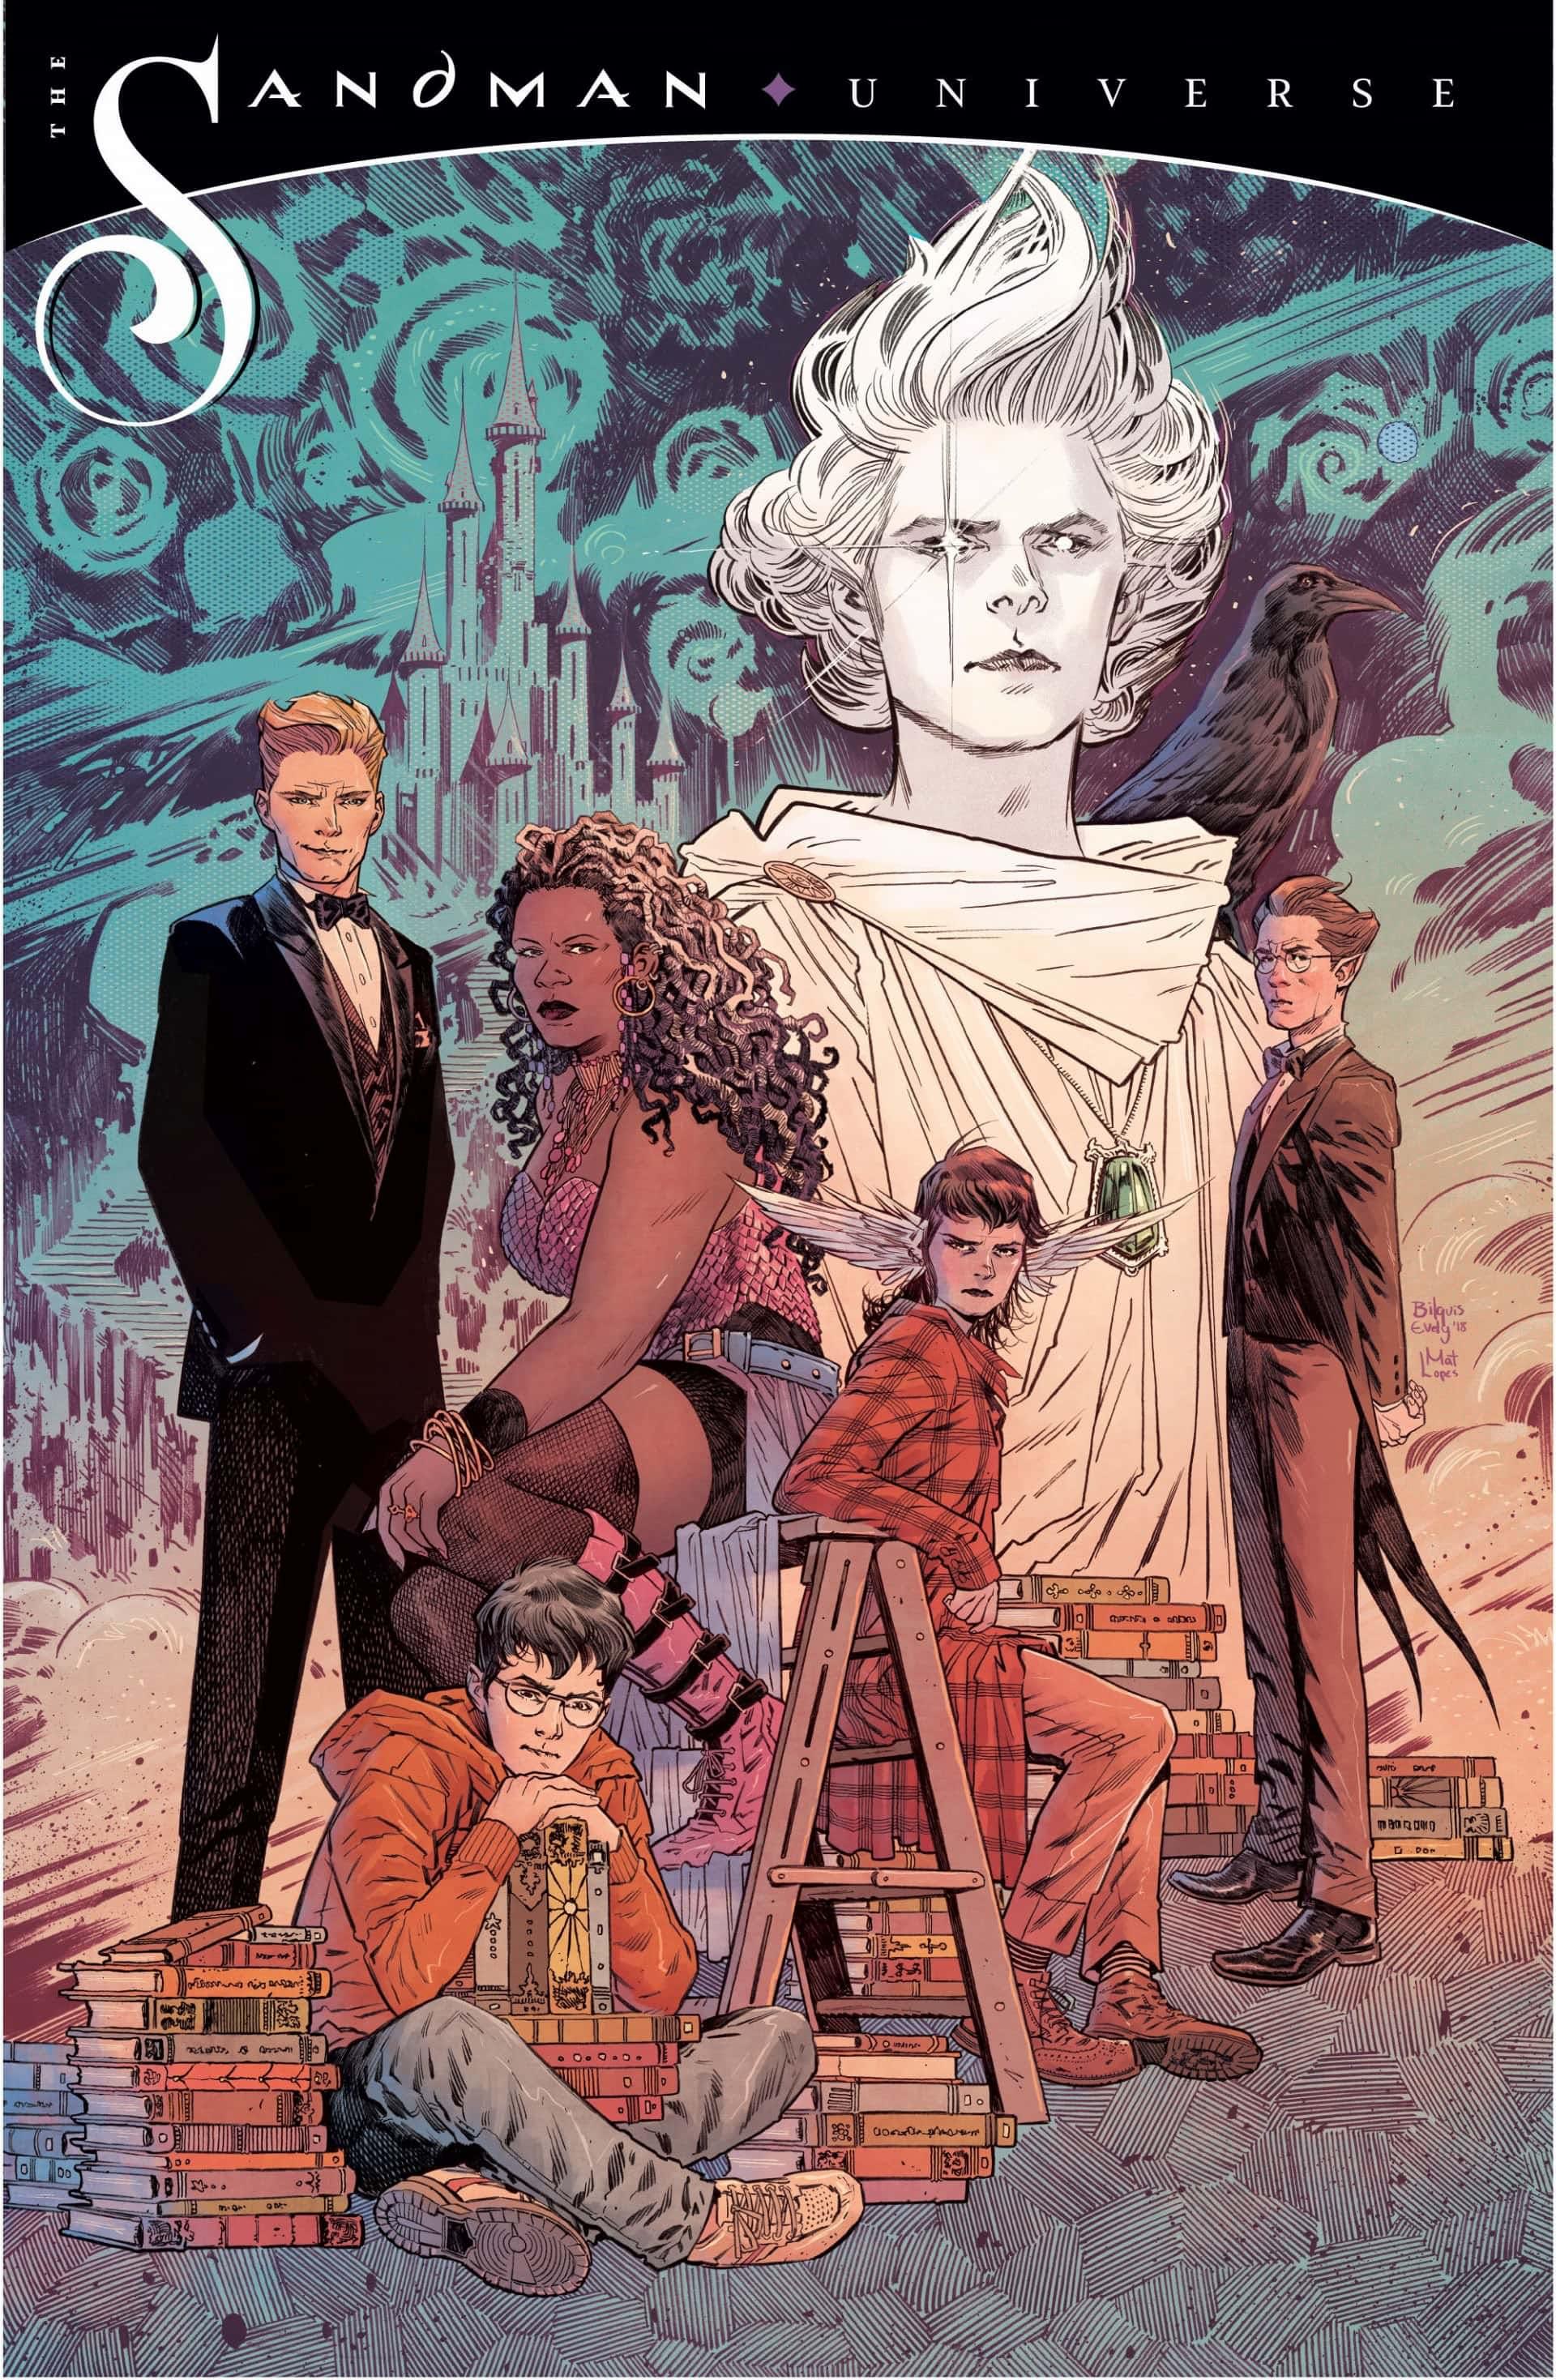 sandman universe comic - DC Comics Is Launching an Extended 'Sandman' Universe